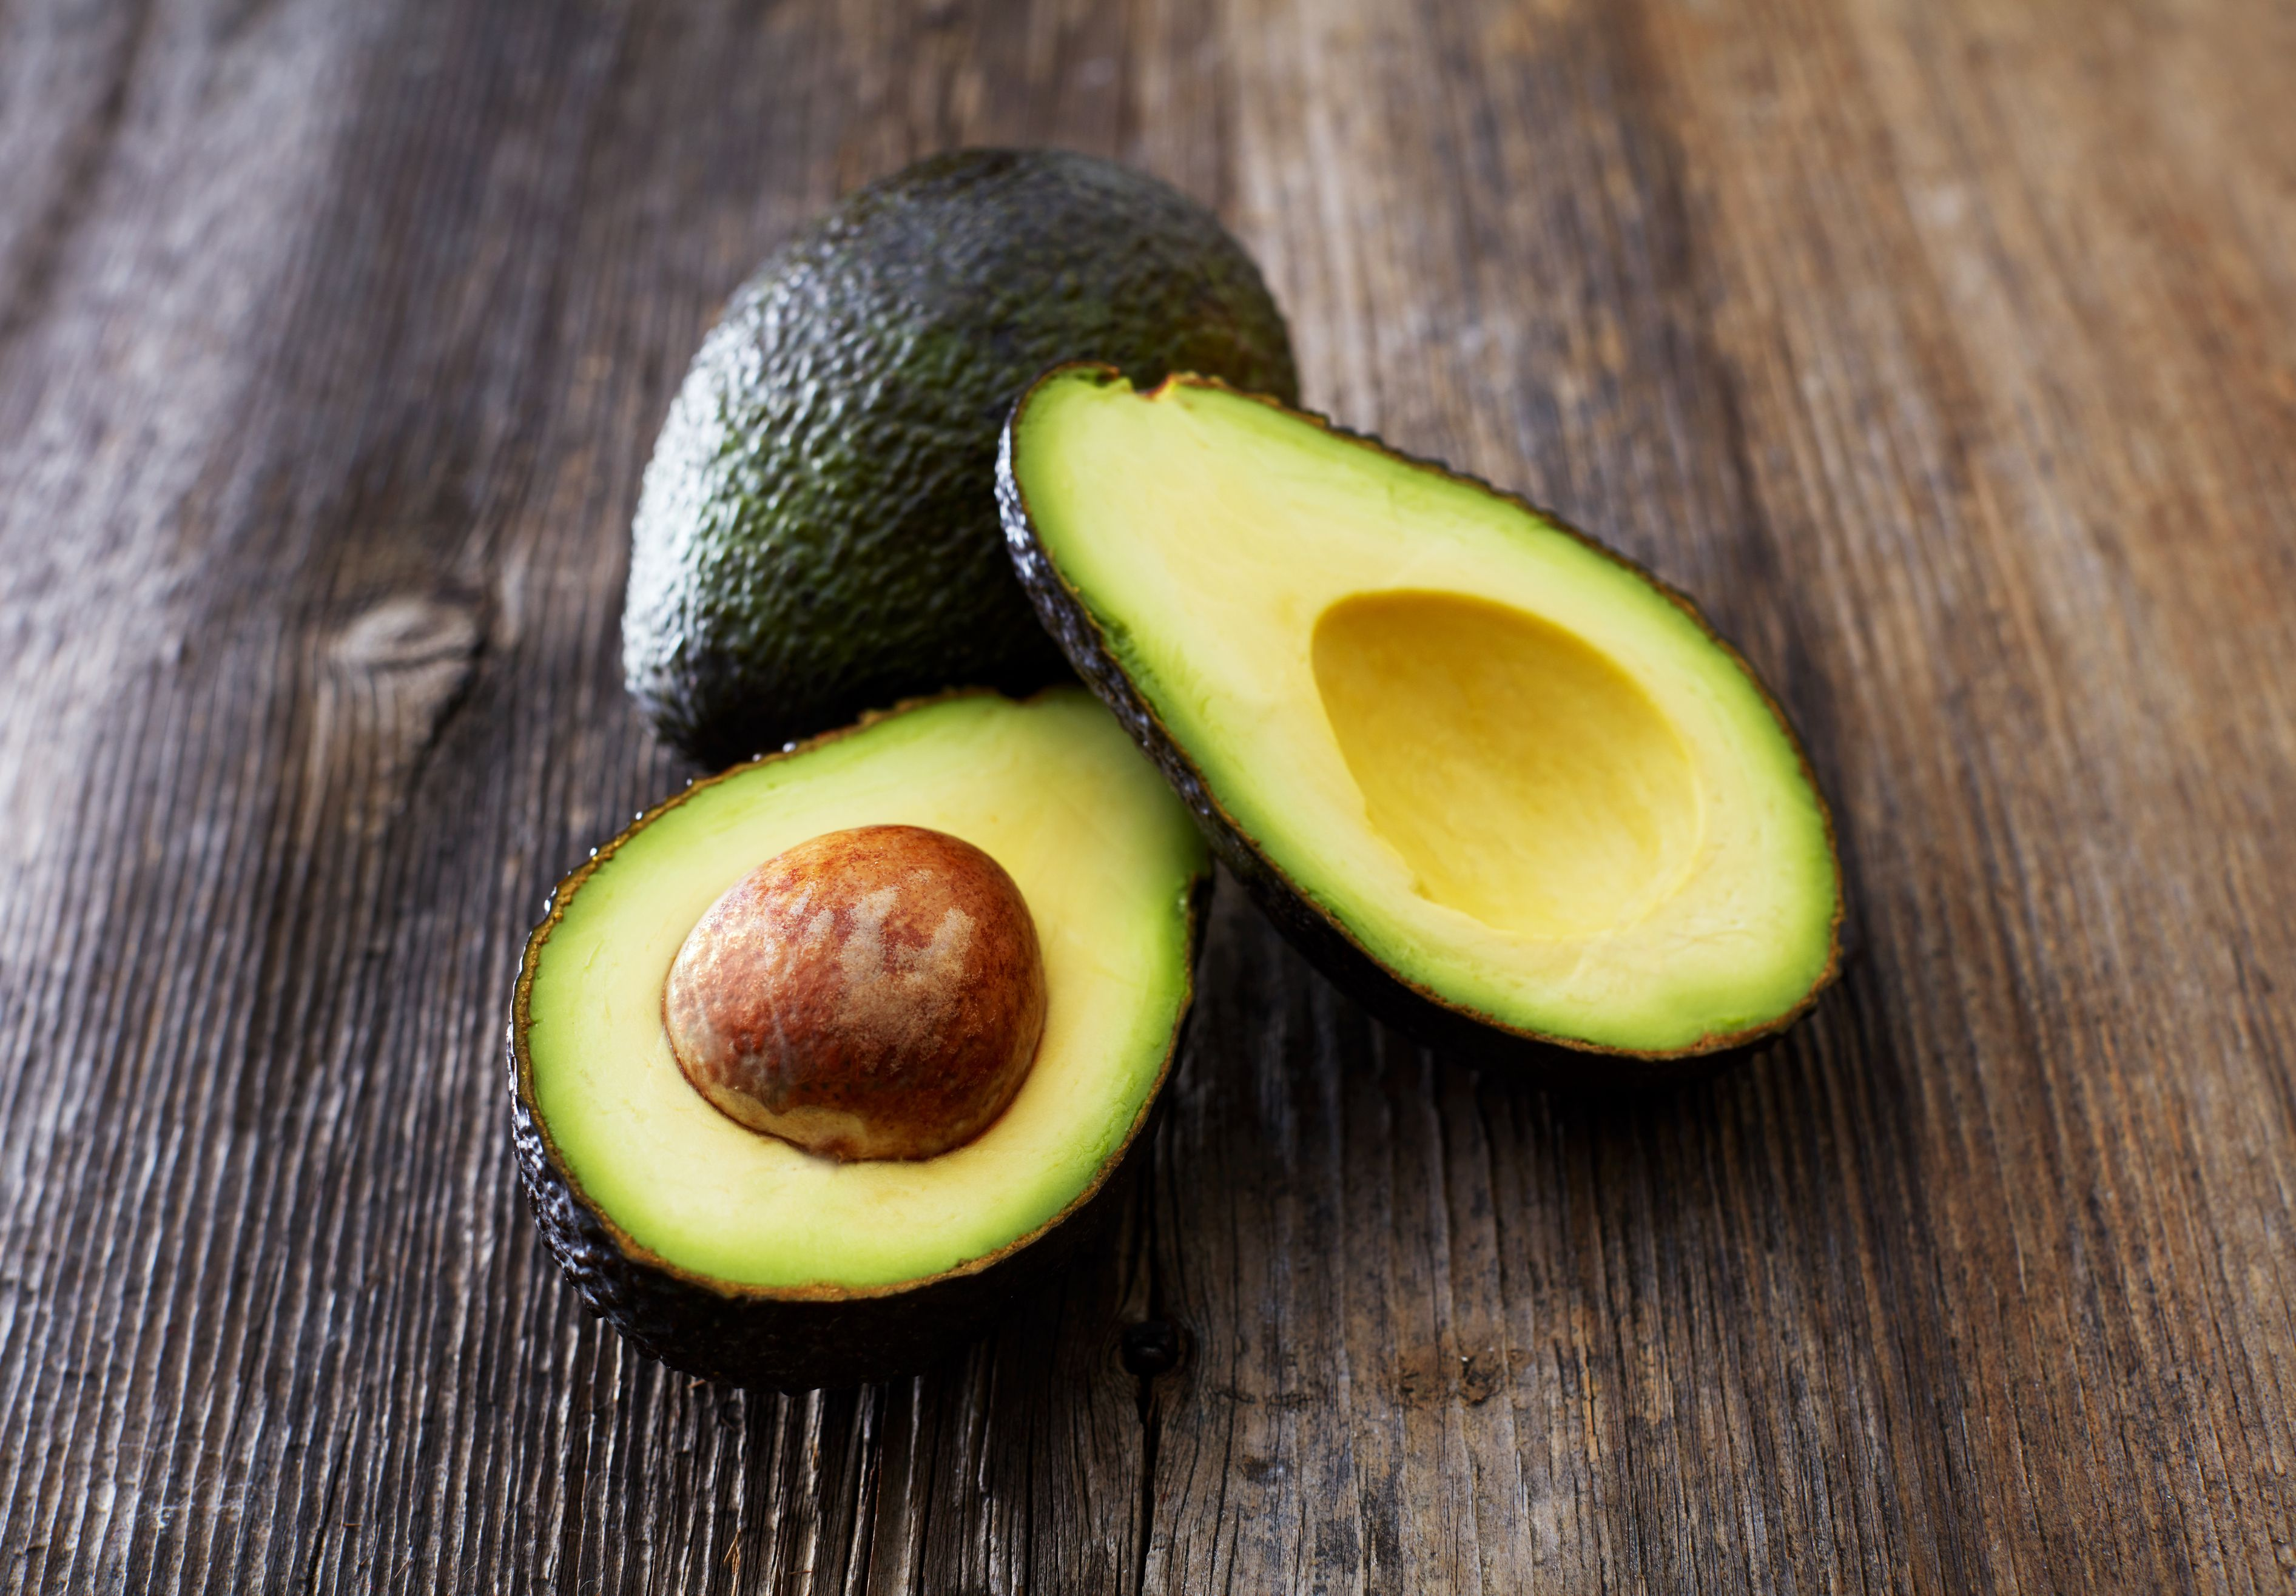 Listeria On Avocado Skins - Healthy Food Green Vegetables